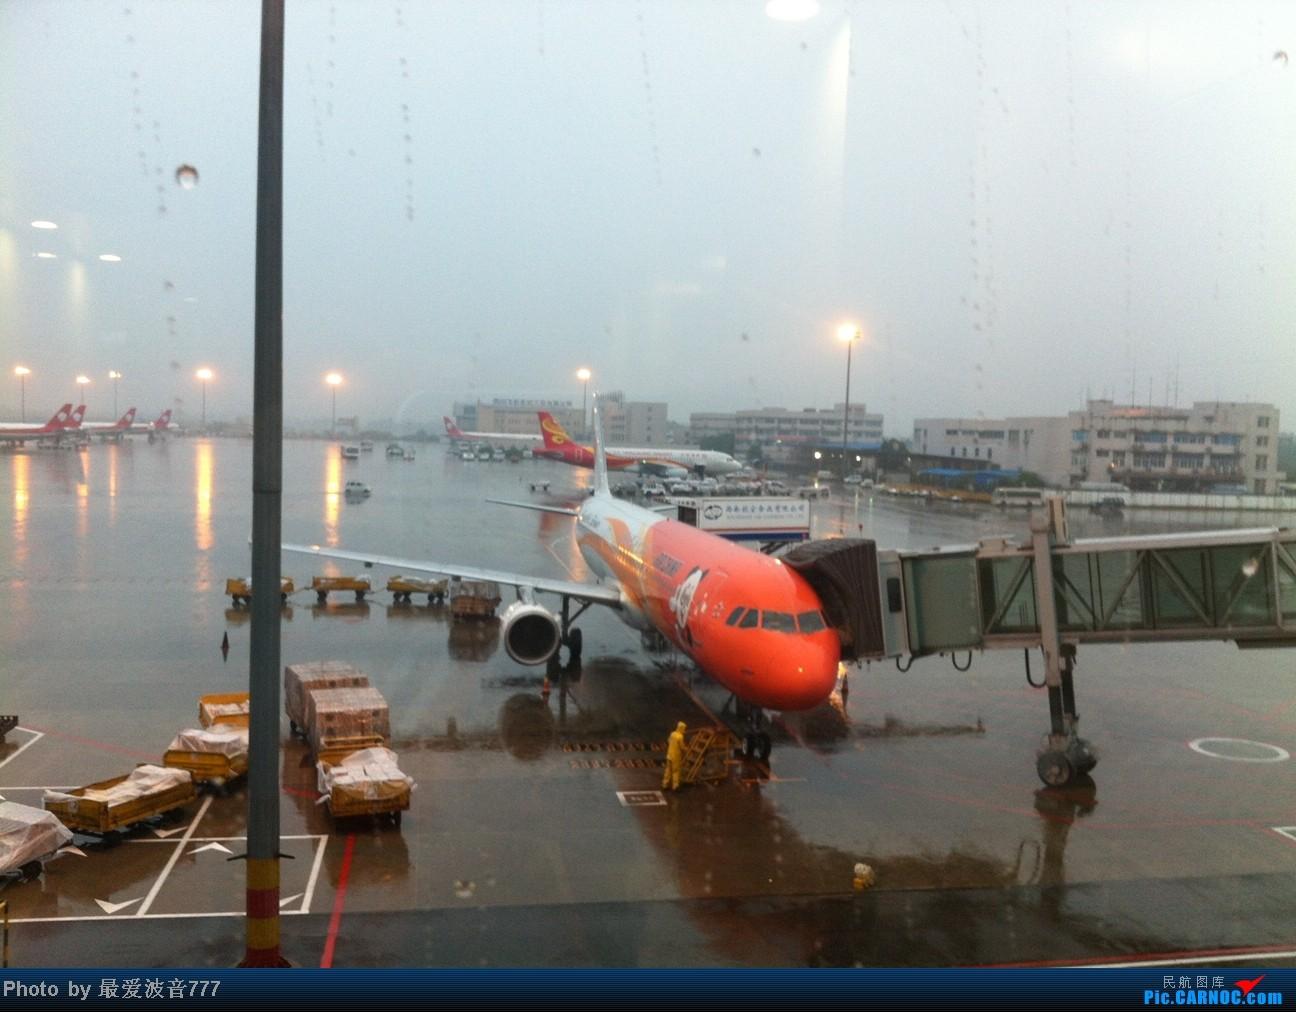 Re:[原创]假期的回国往返之旅 LHR-HKG-CTU-HKG-LHR, CX+CA+KA联合运营 AIRBUS A321-200 B-6361 中国成都双流机场